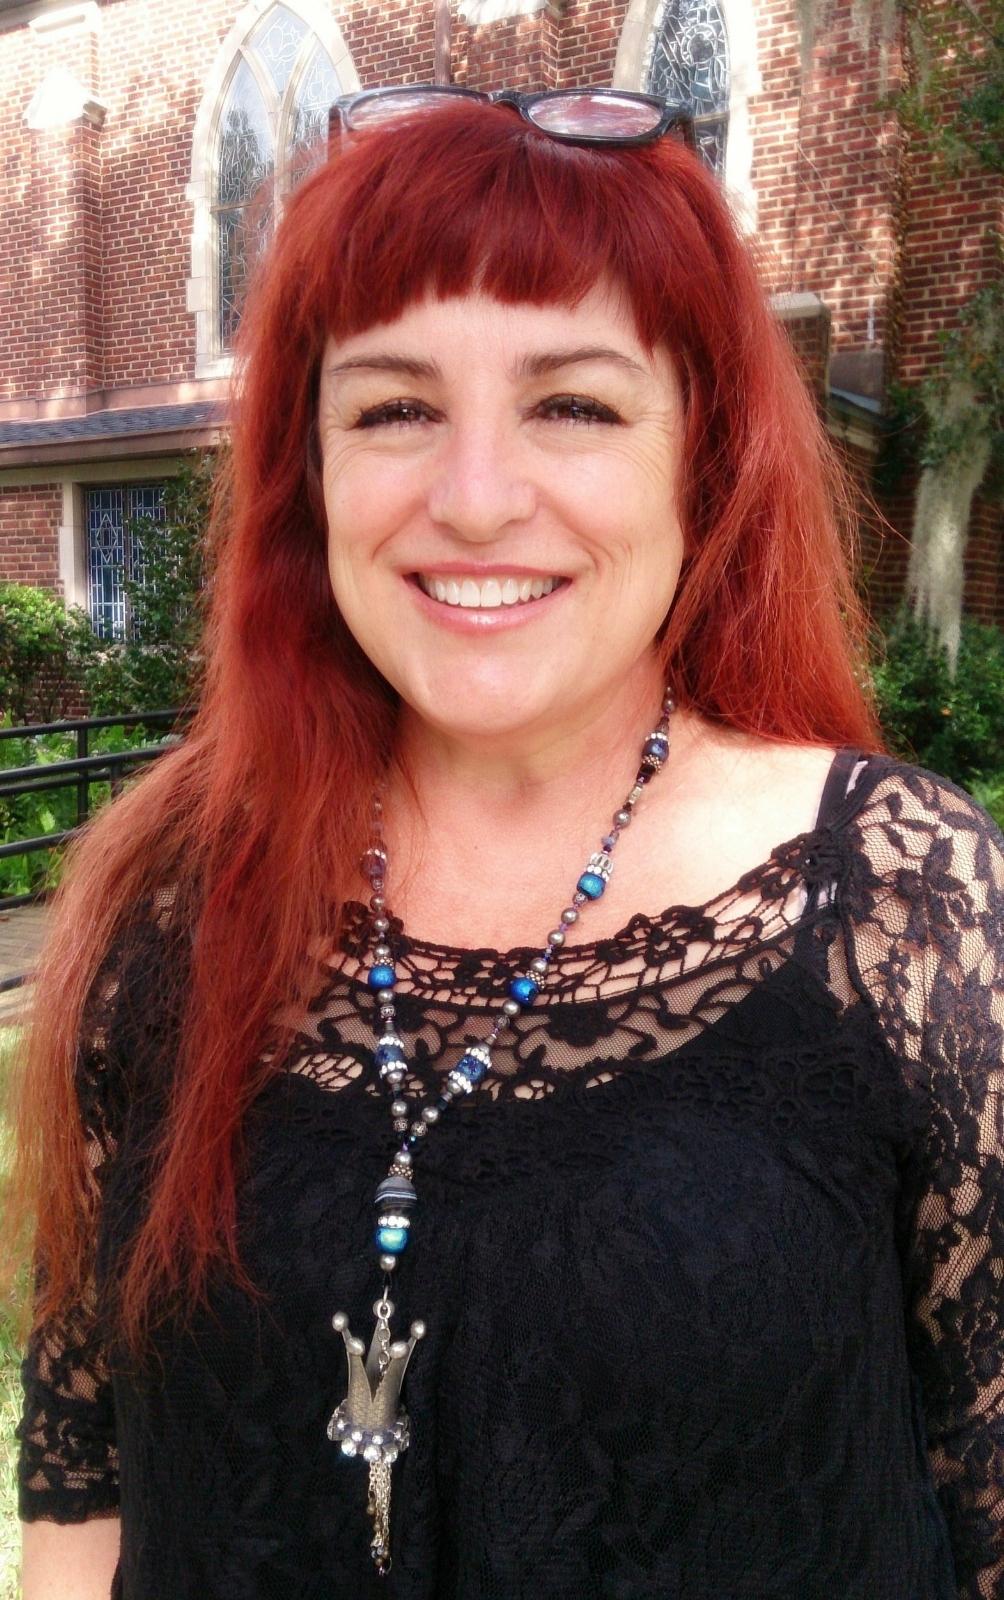 Artist Caroline Daley